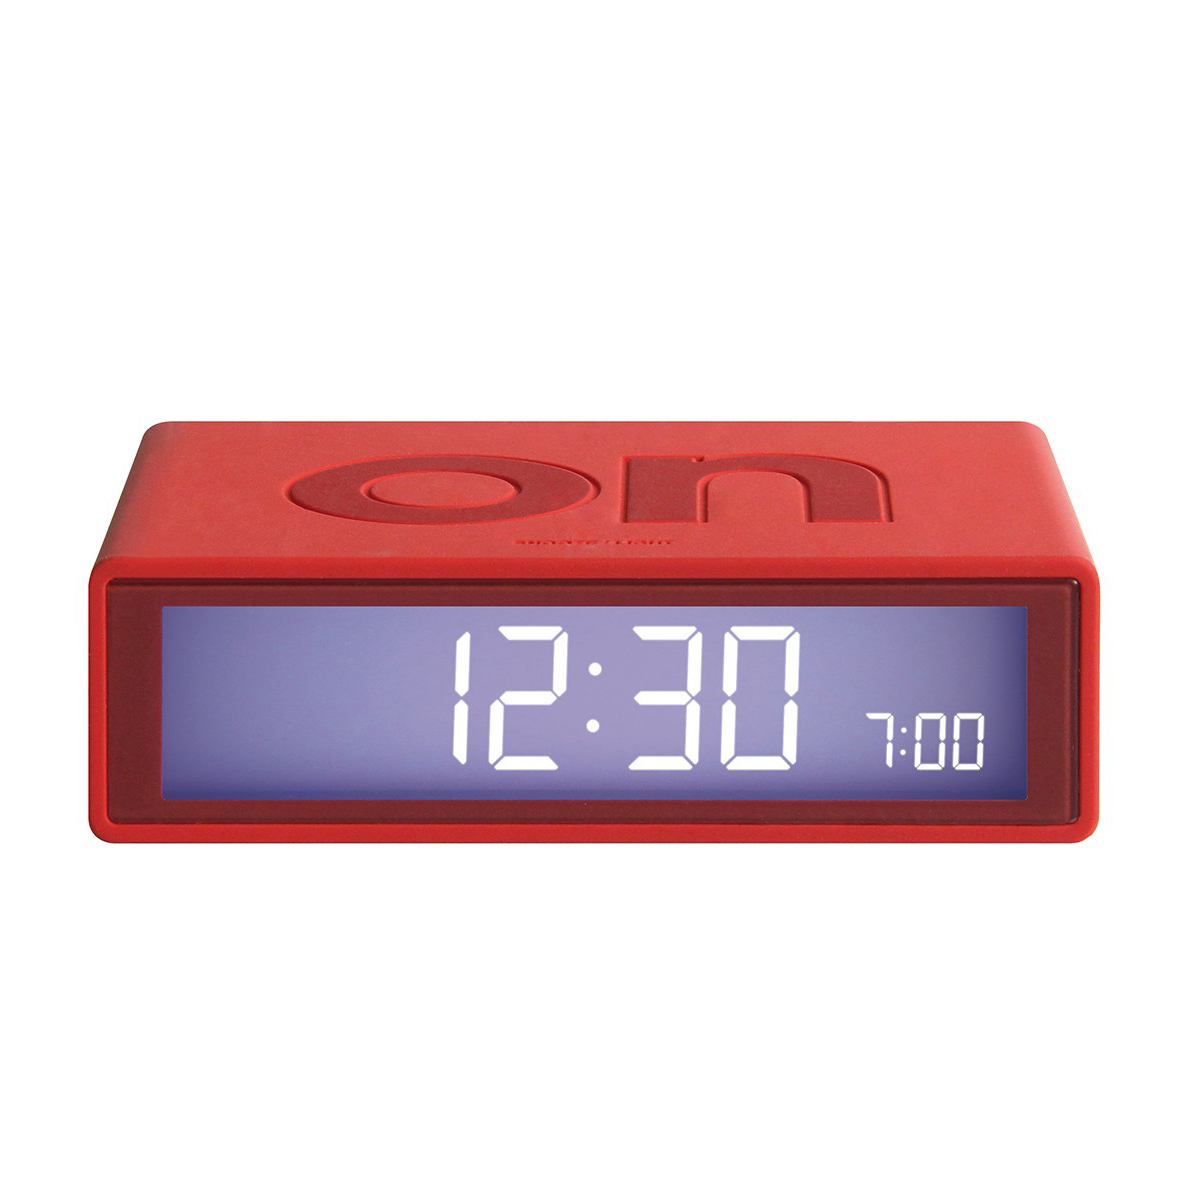 LEXON Flip LCD alarm clock LR130 red | The Design Gift Shop